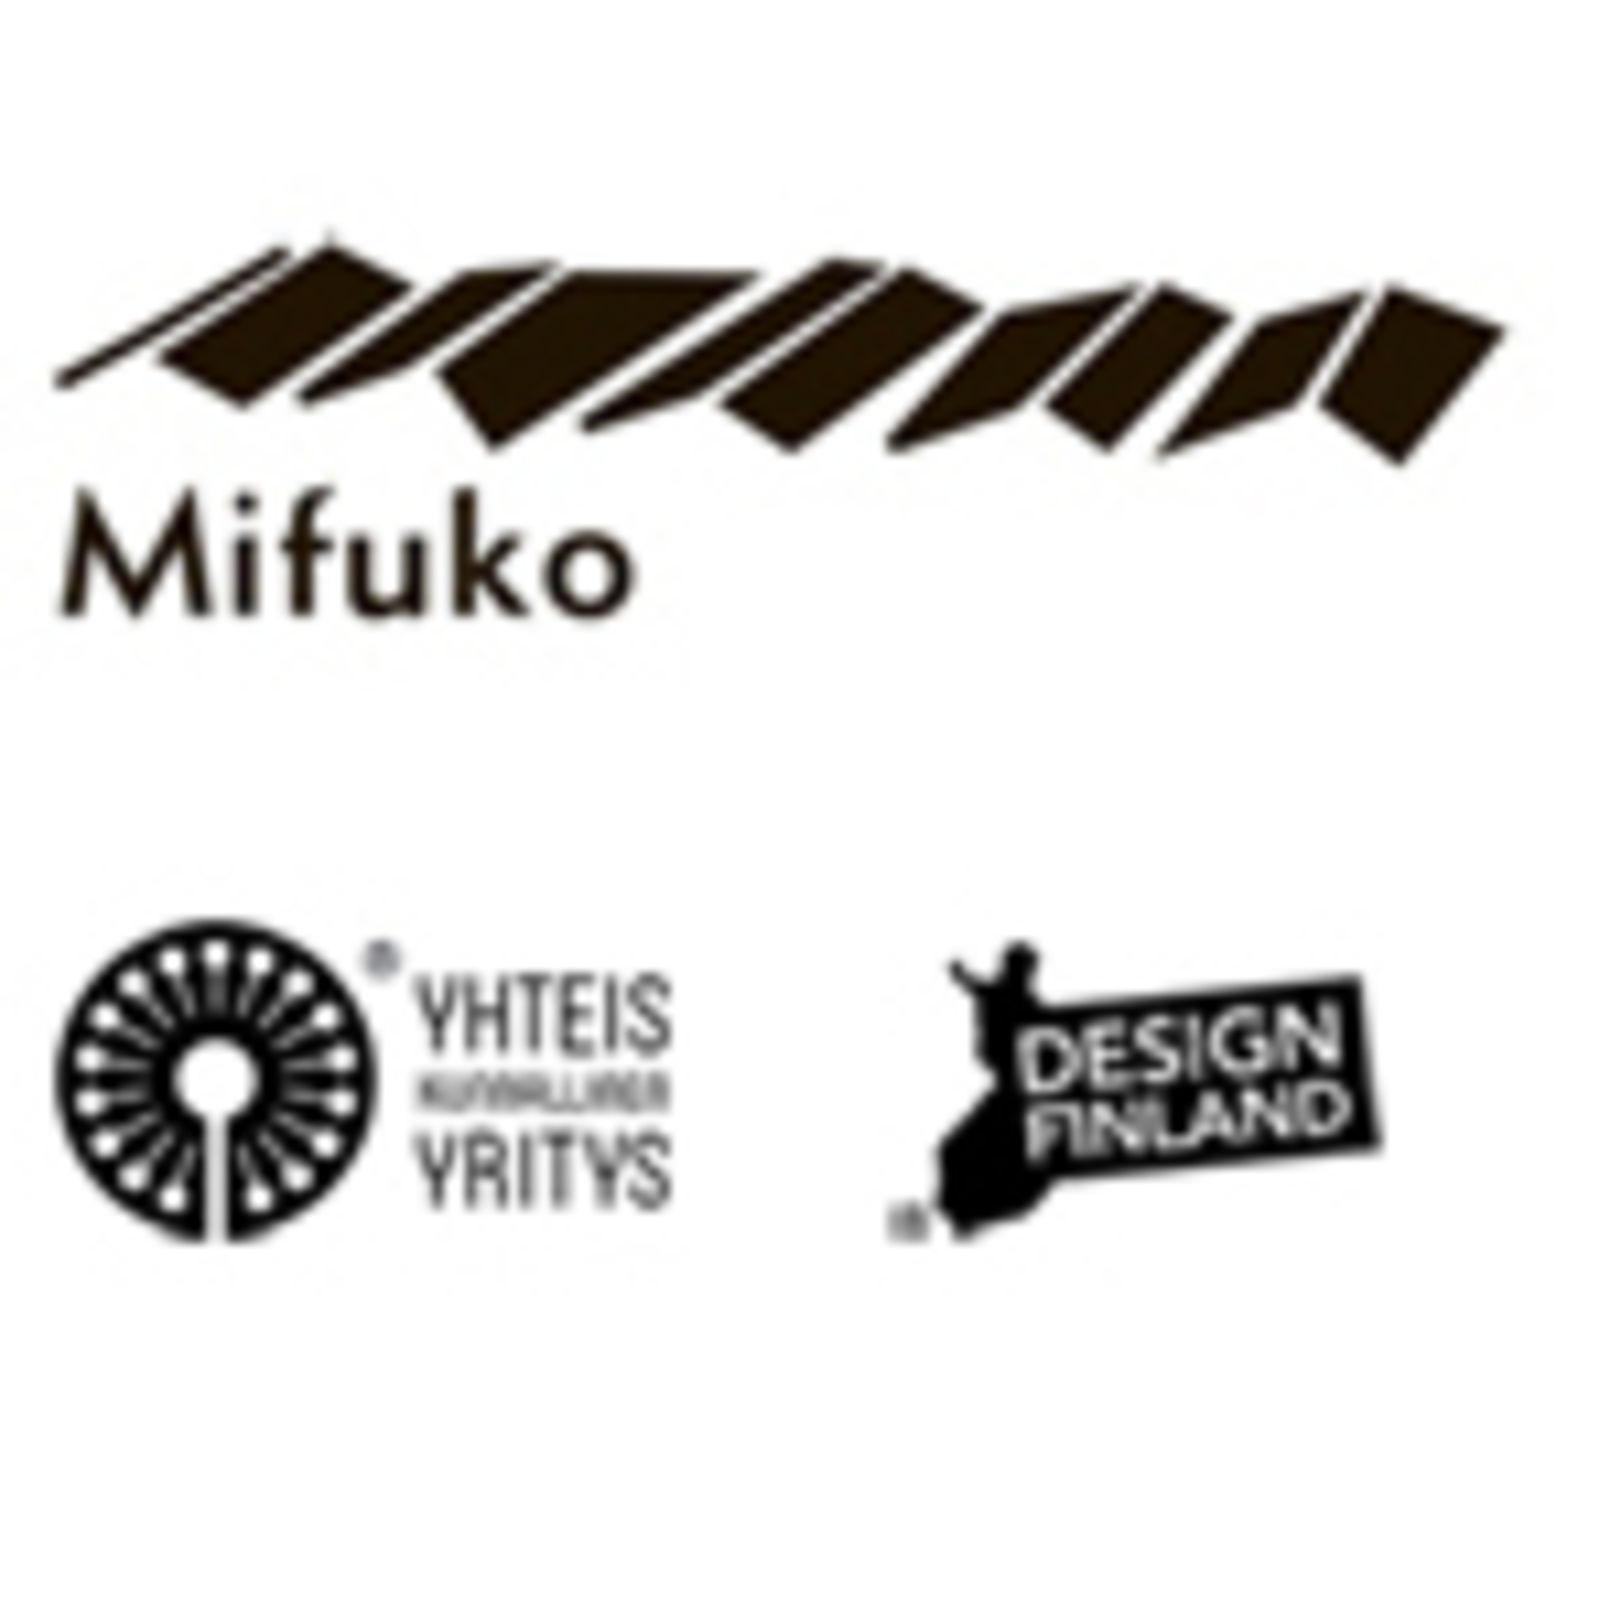 Mifuko (Изображение 1)